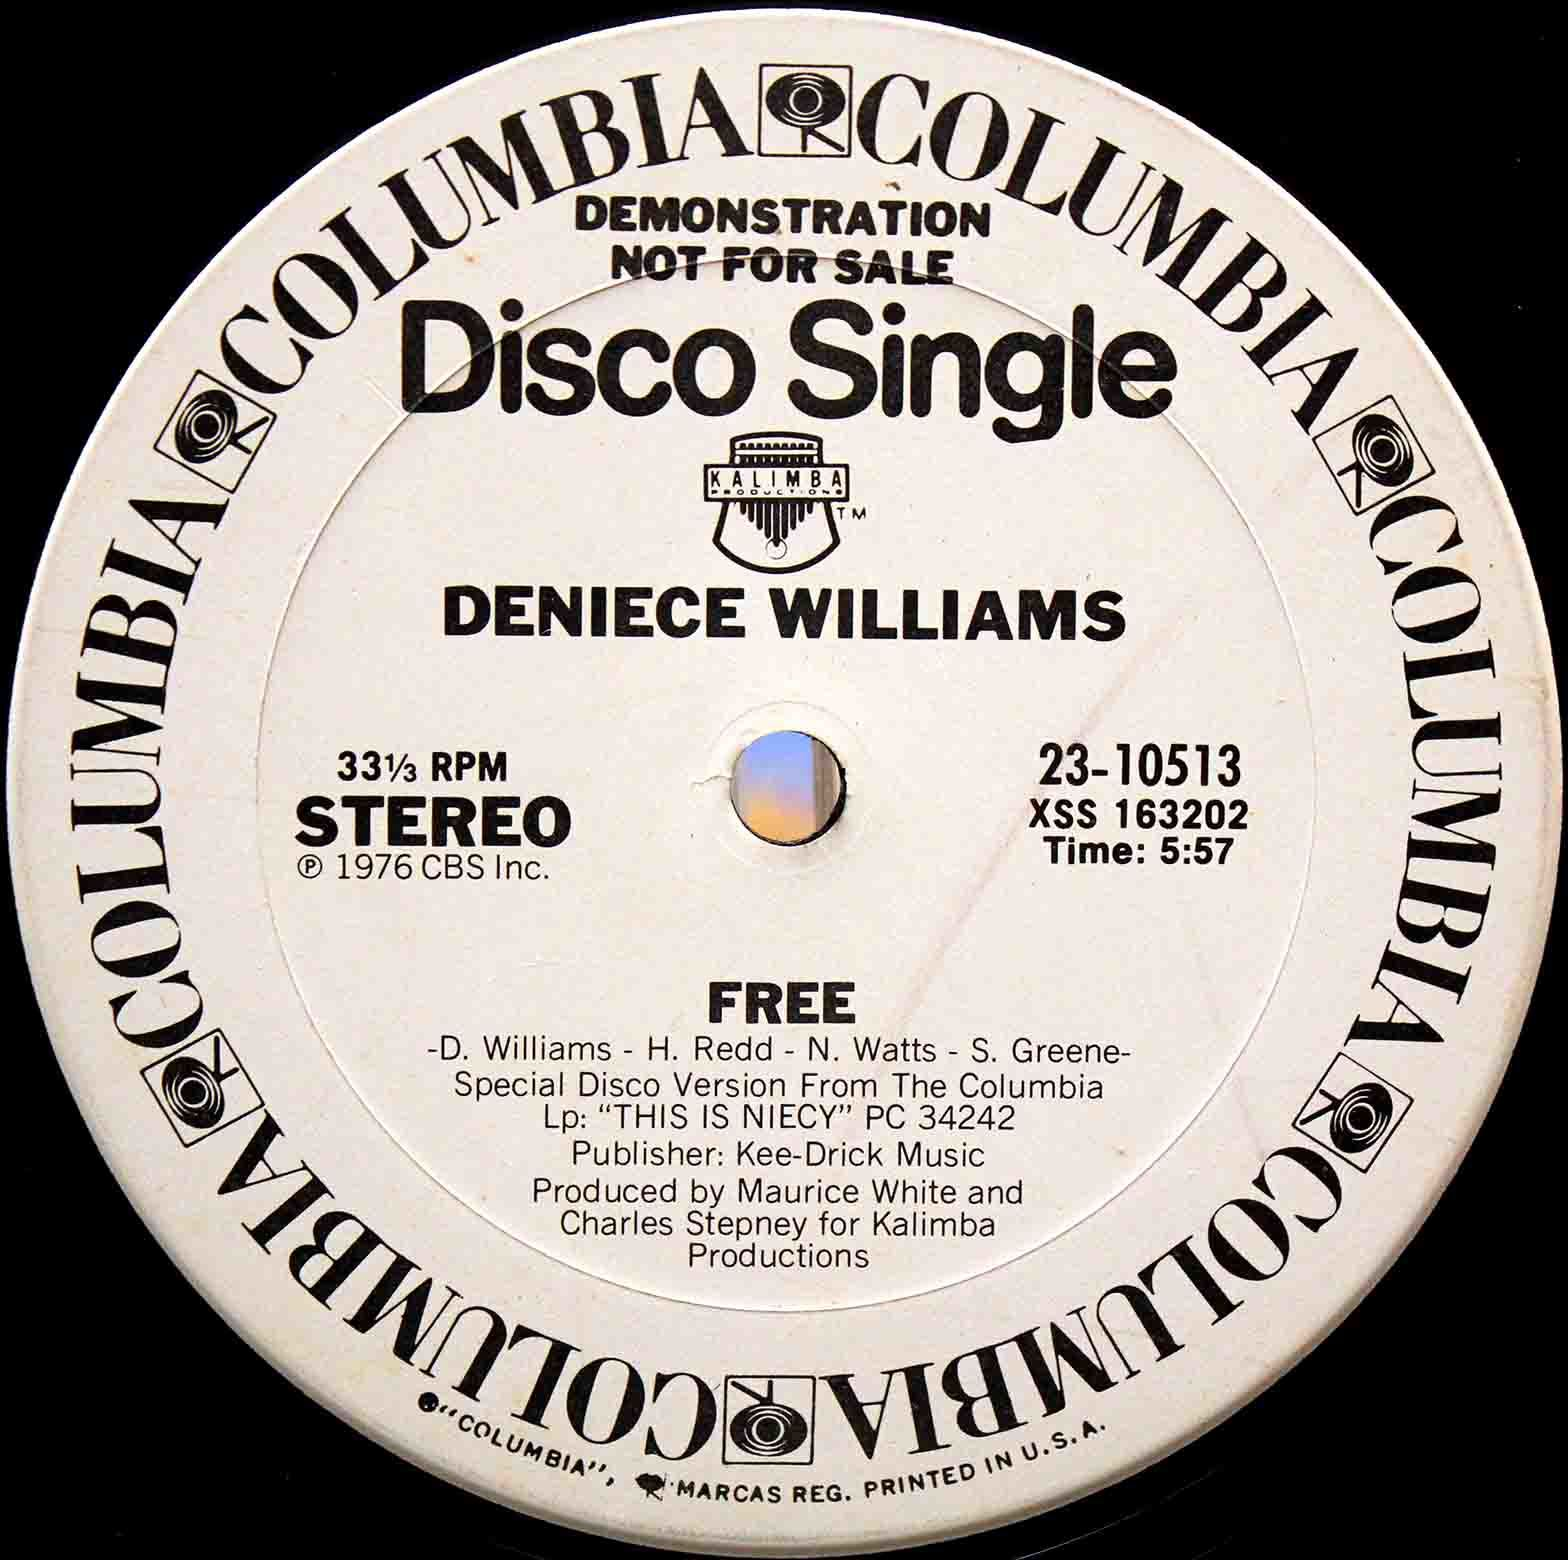 Deniece Williams - Free 03